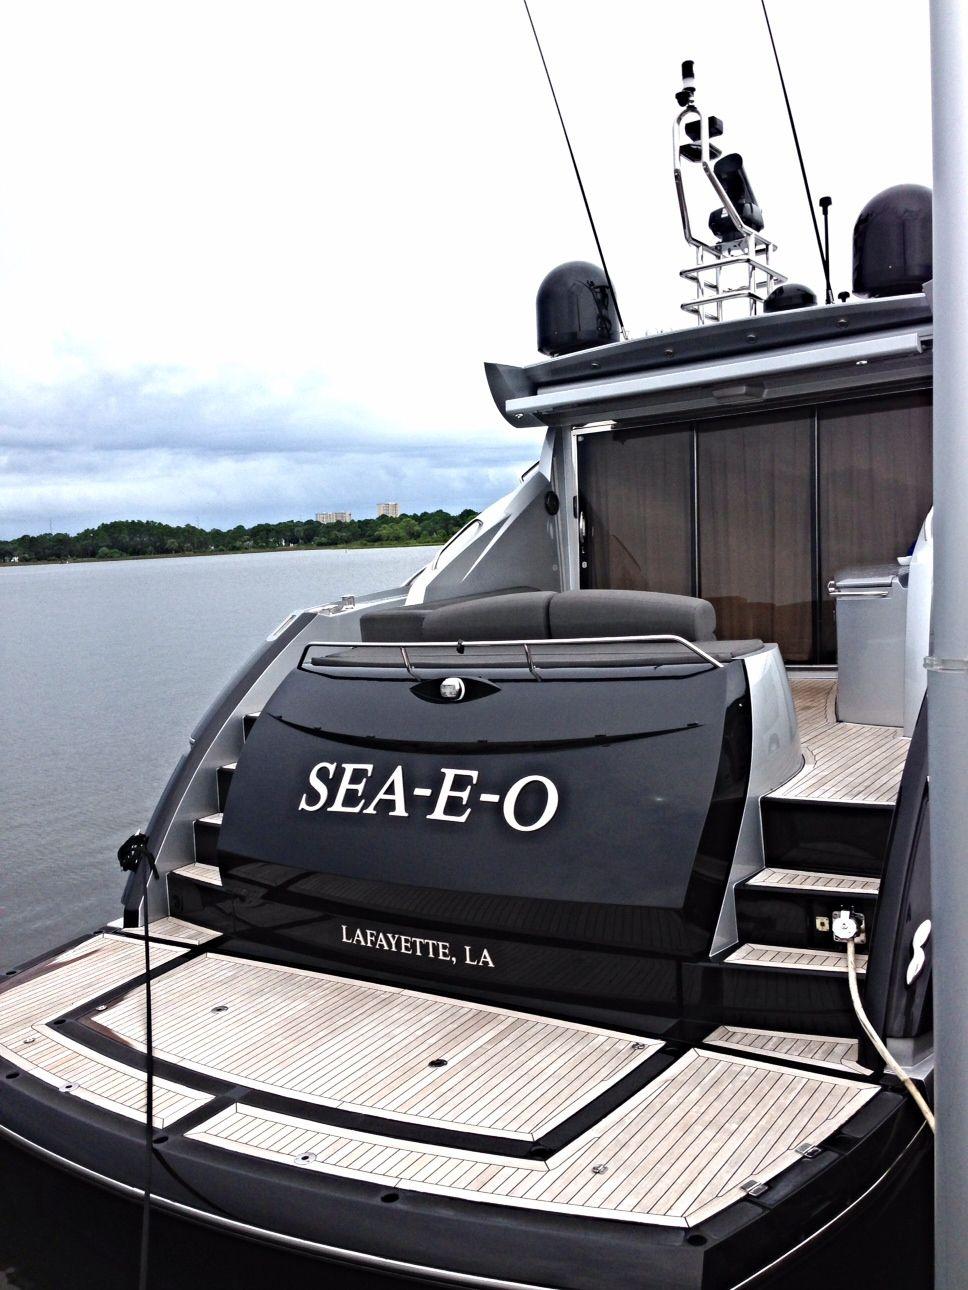 Best boat name ever ceo bestboatever photo credit lisa ellis